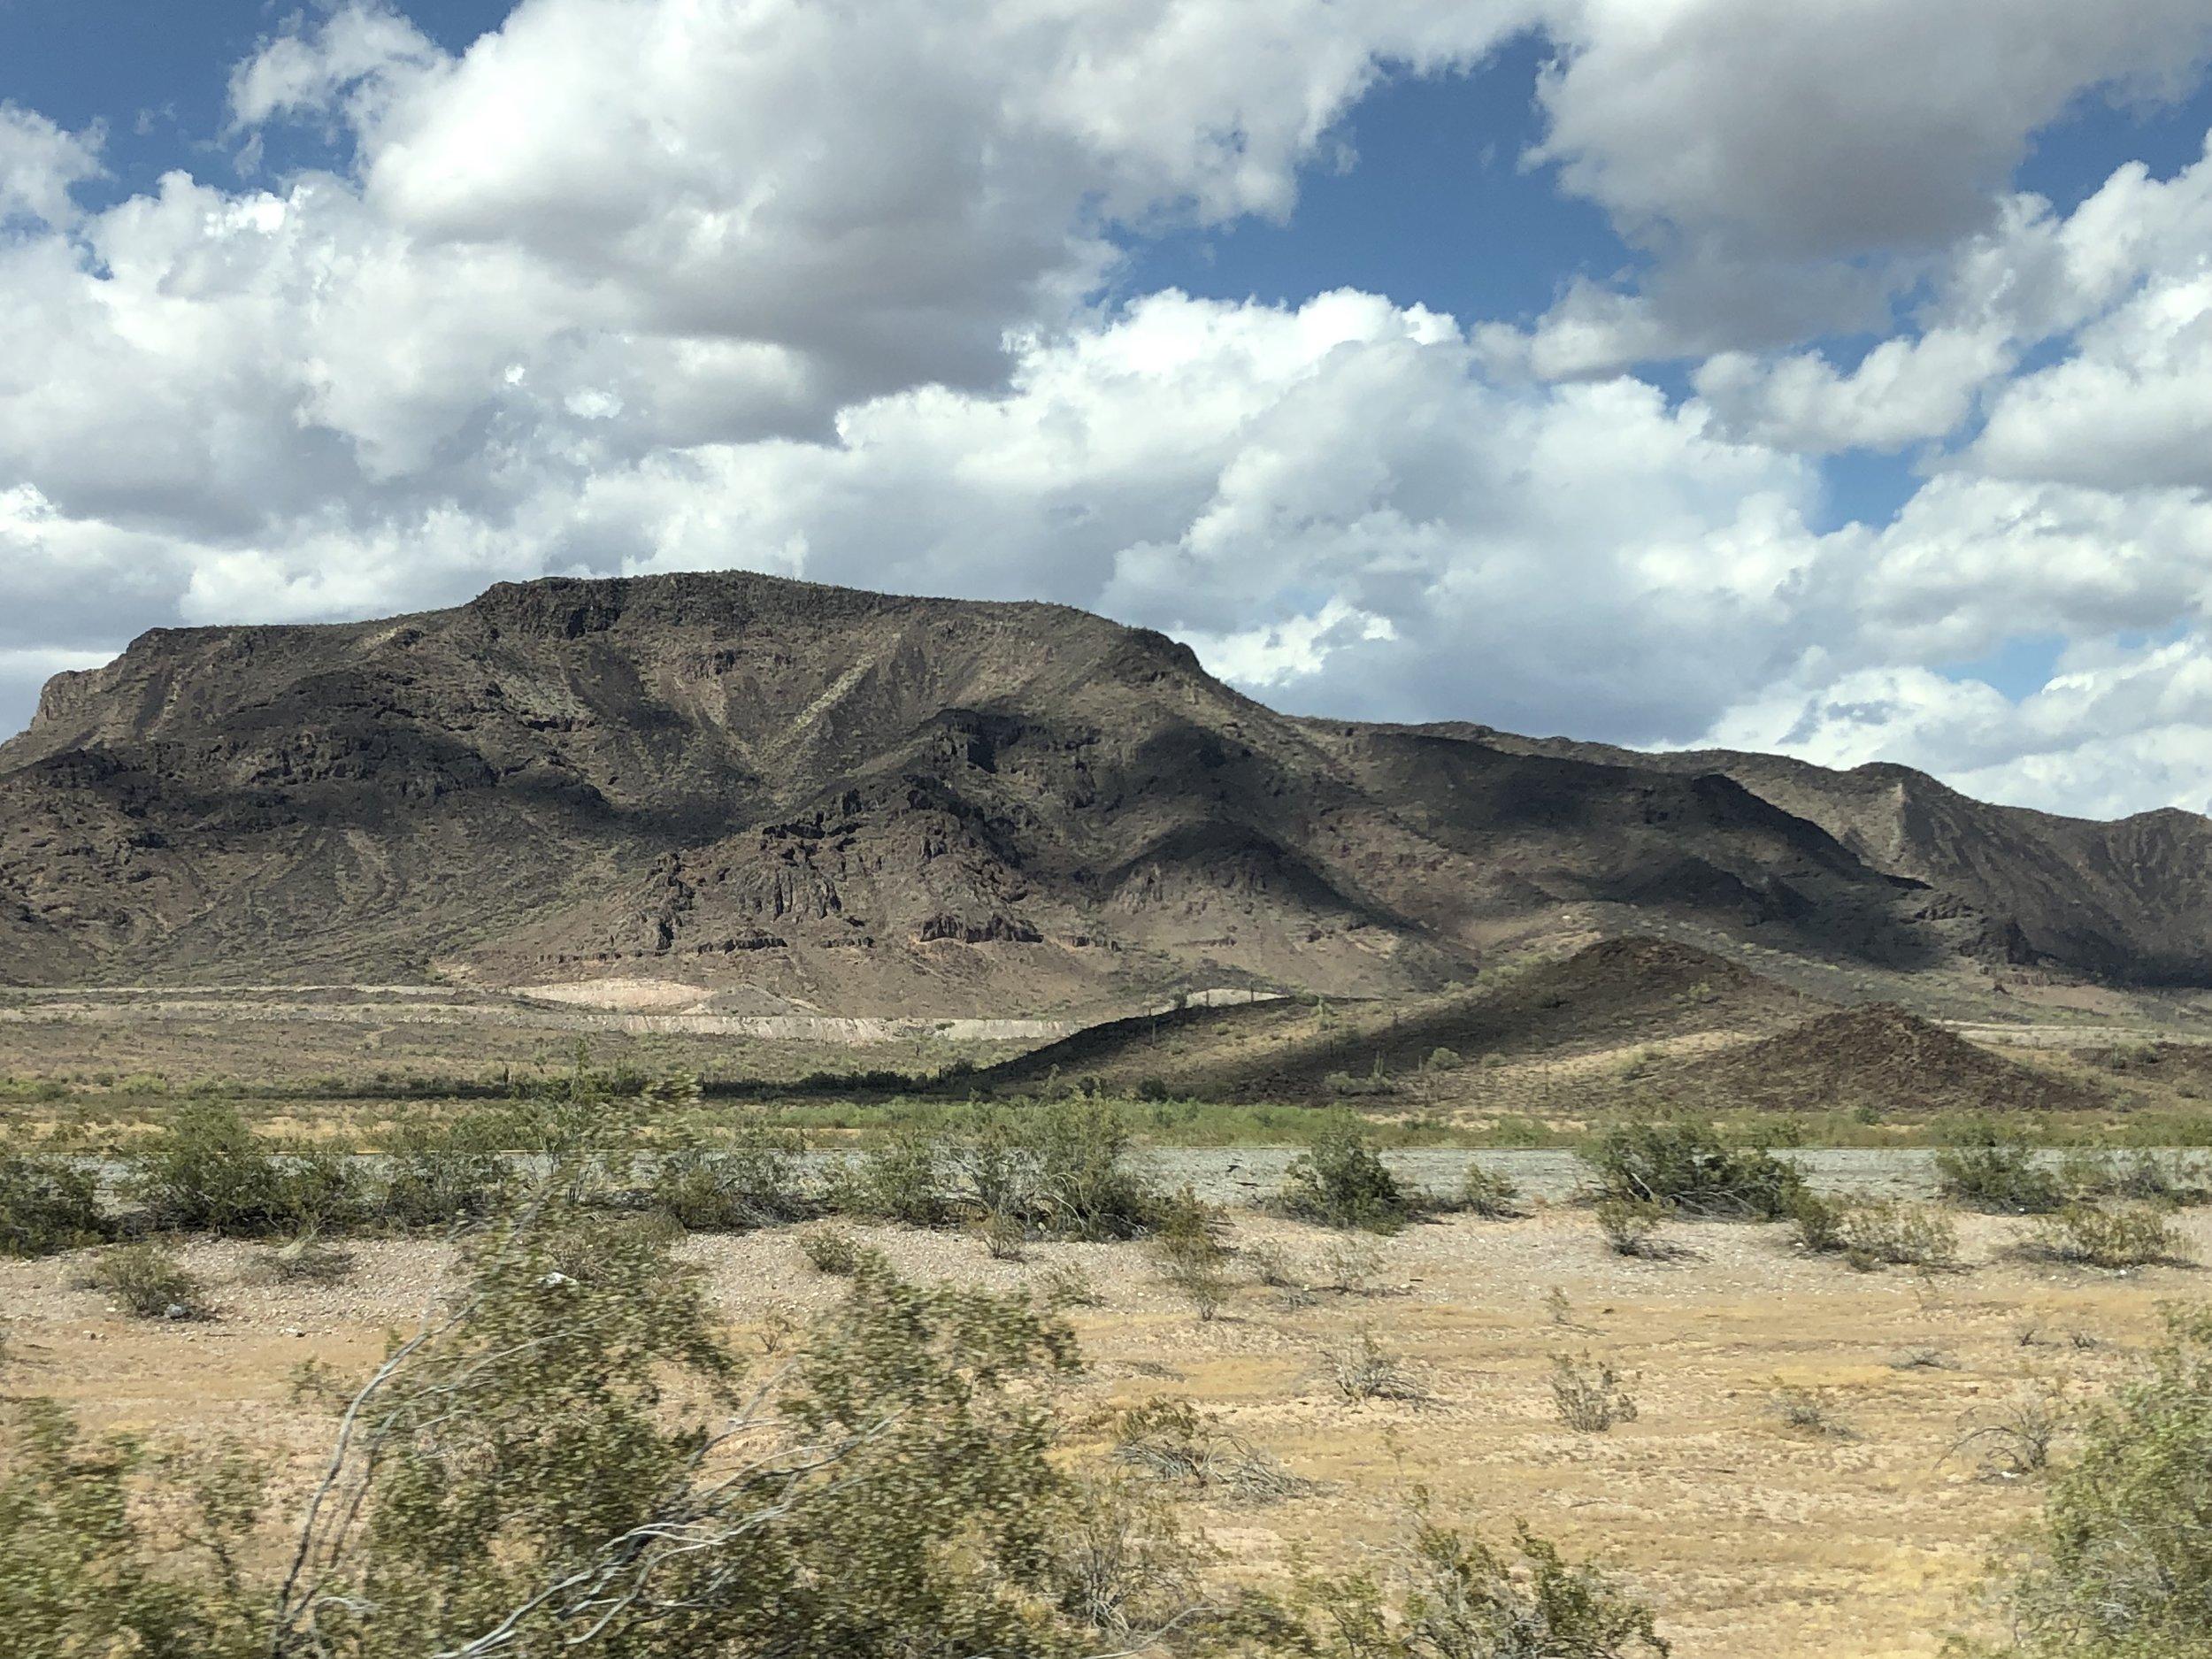 Arizona. Need I say more?